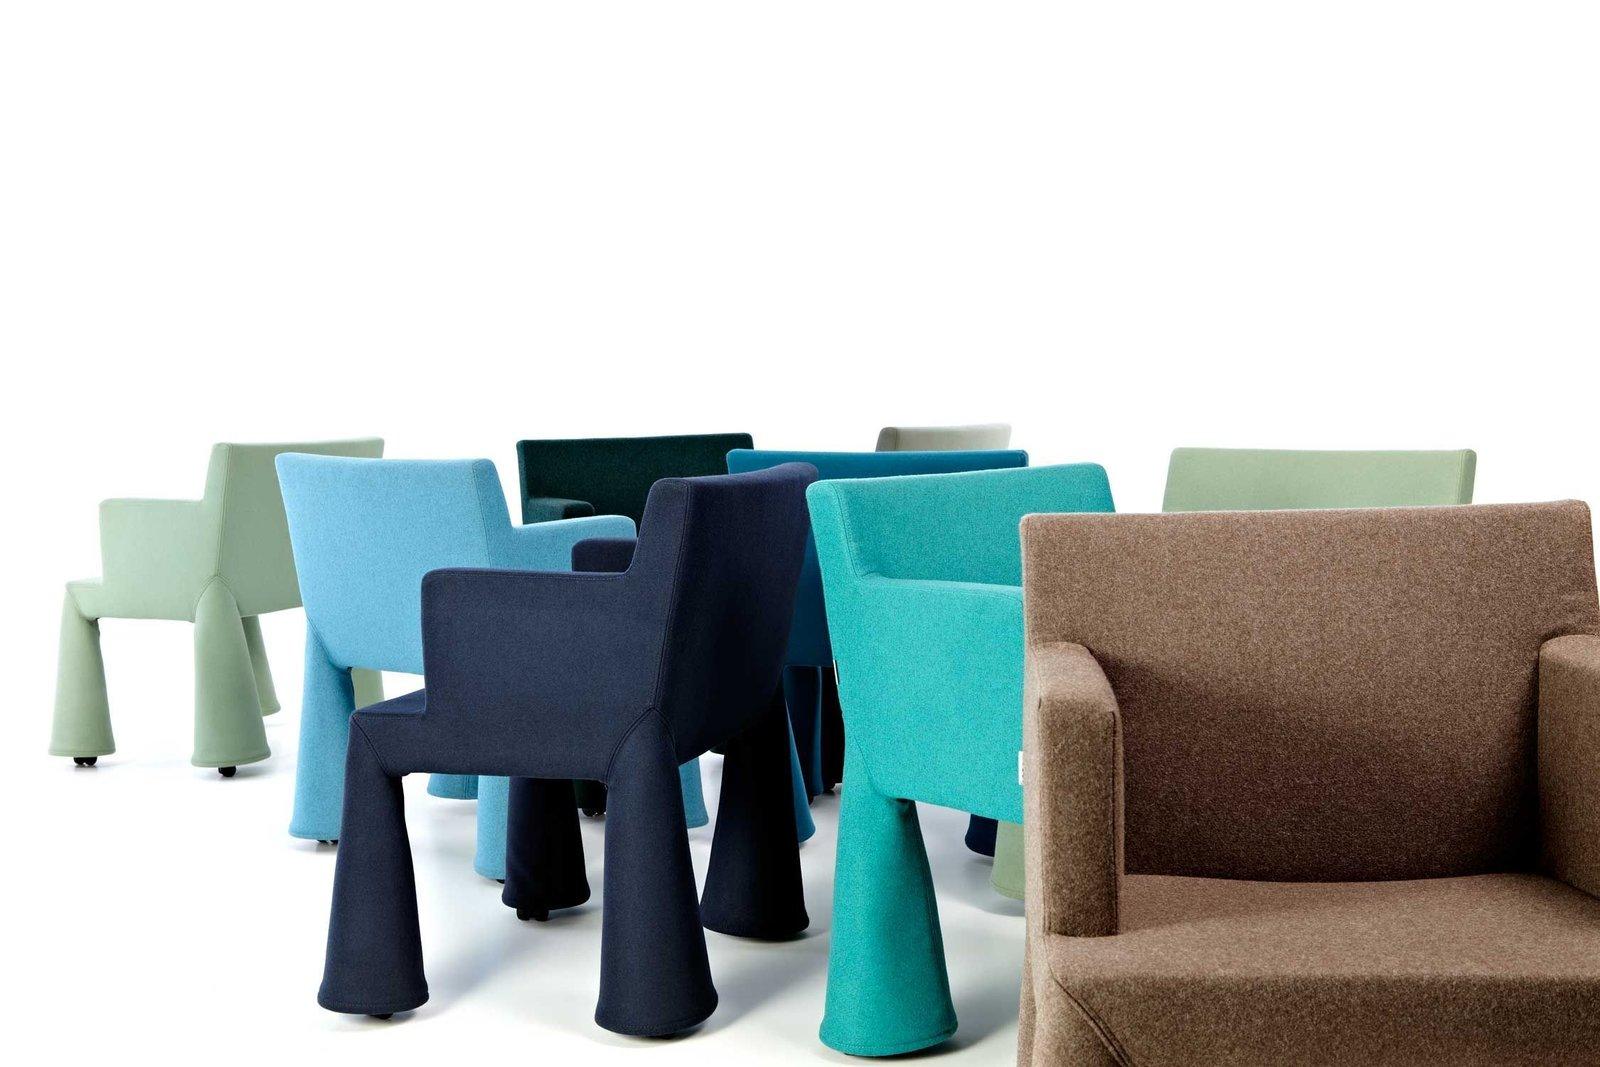 "V.I.P. Chair by Marcel Wanders  ∙ moooi  Search ""순천출장마사지-출장안마-출장-출장서비스 순천콜걸 출장샵 주소ㅋr톡BC388 주소[sannhu222,vip] 순천 출장여대생 만남 출장만남 업소 타이마사지 출장샵추천 업소  순천출장샵 출장서비스 출장업소"""